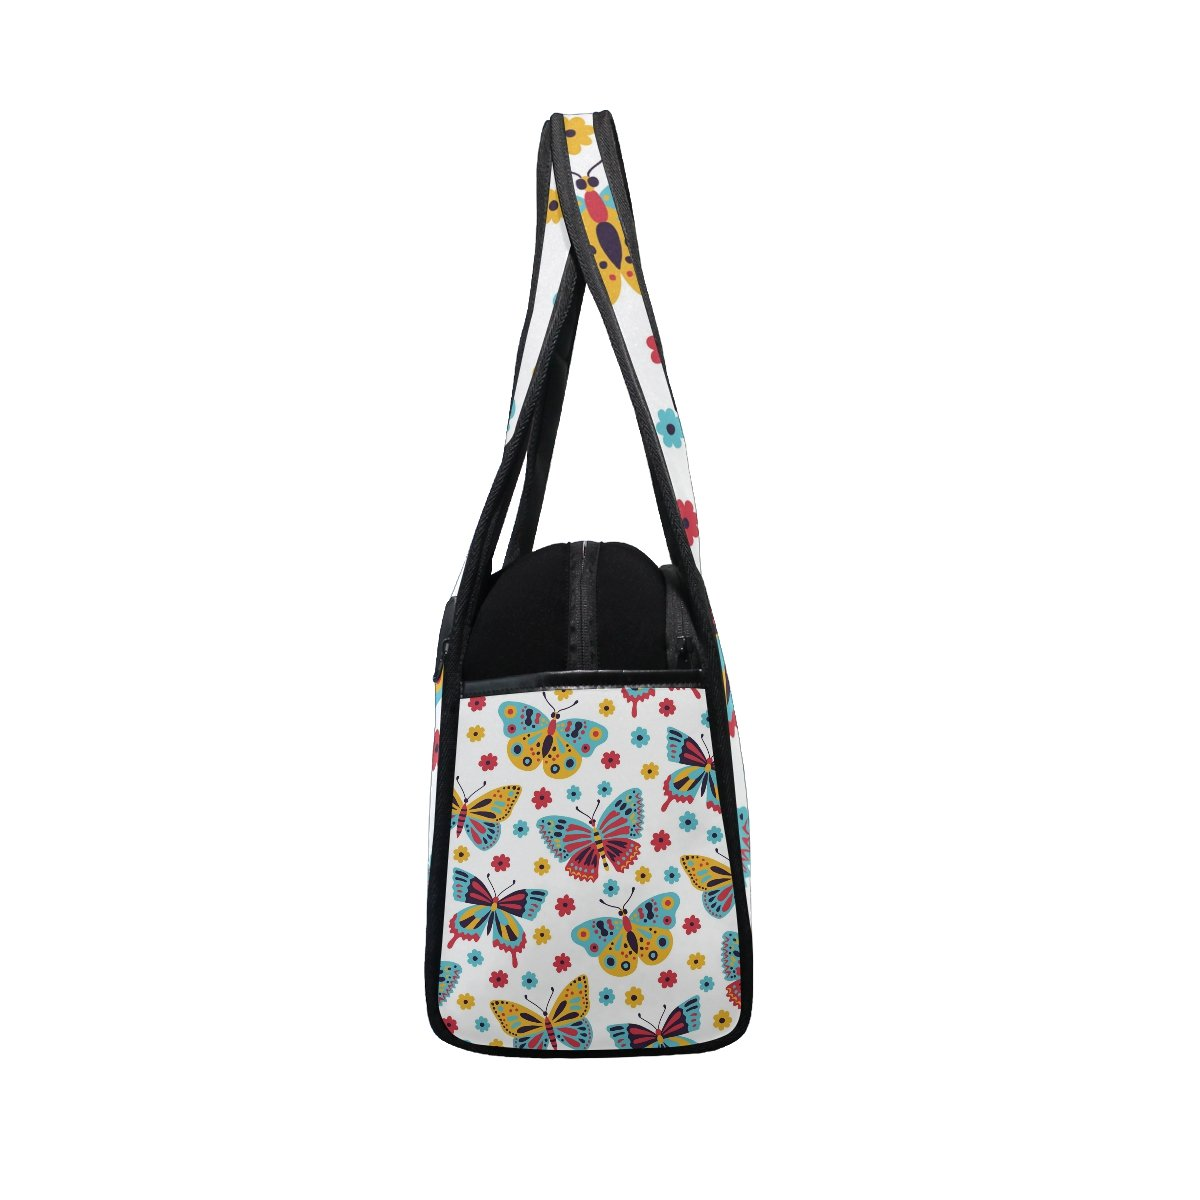 AHOMY Canvas Sports Gym Bag Butterfly Flower Travel Shoulder Bag